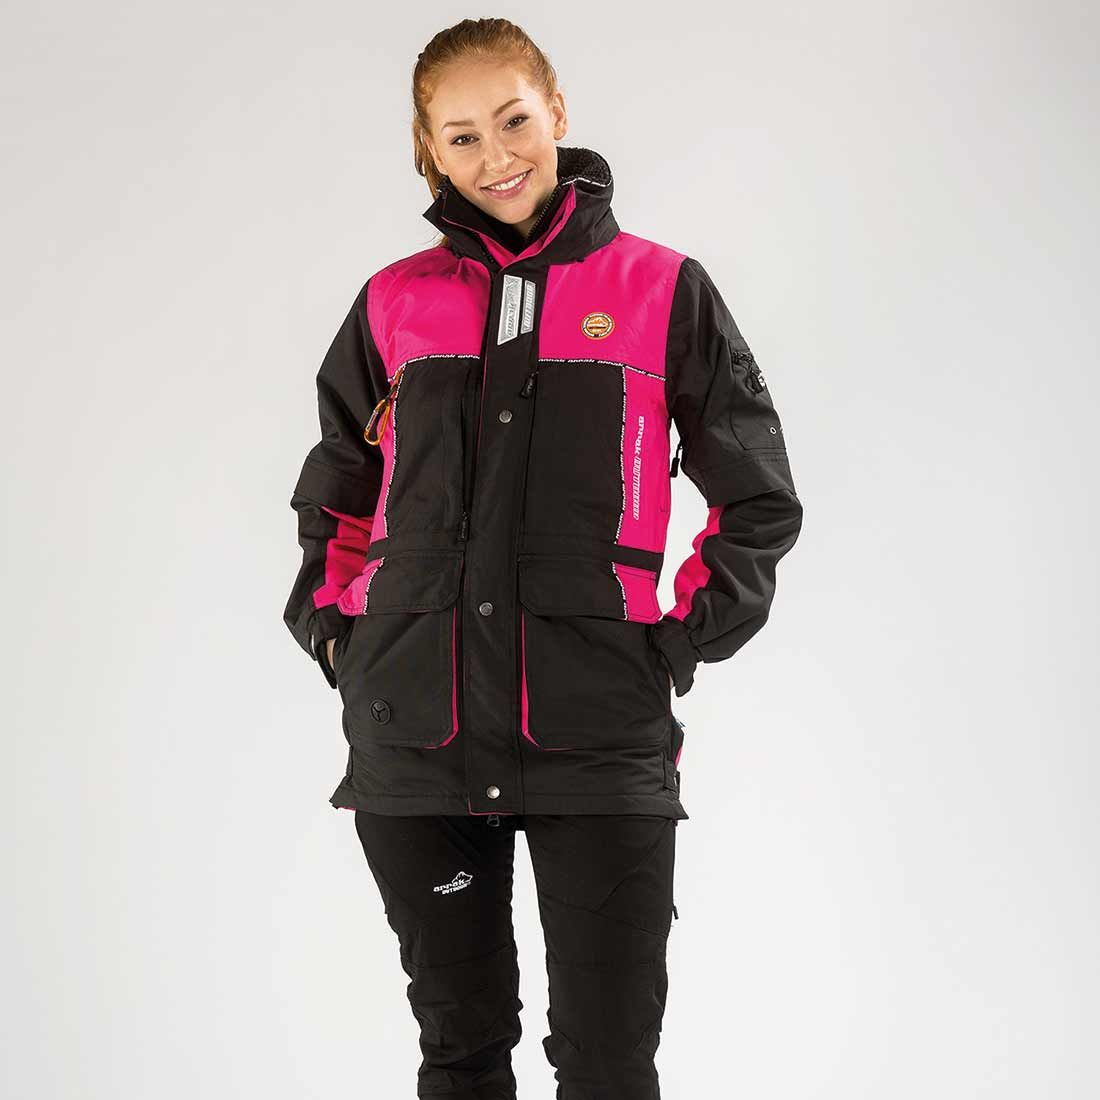 Arrak New Original Jacket Pink/Black 4XL